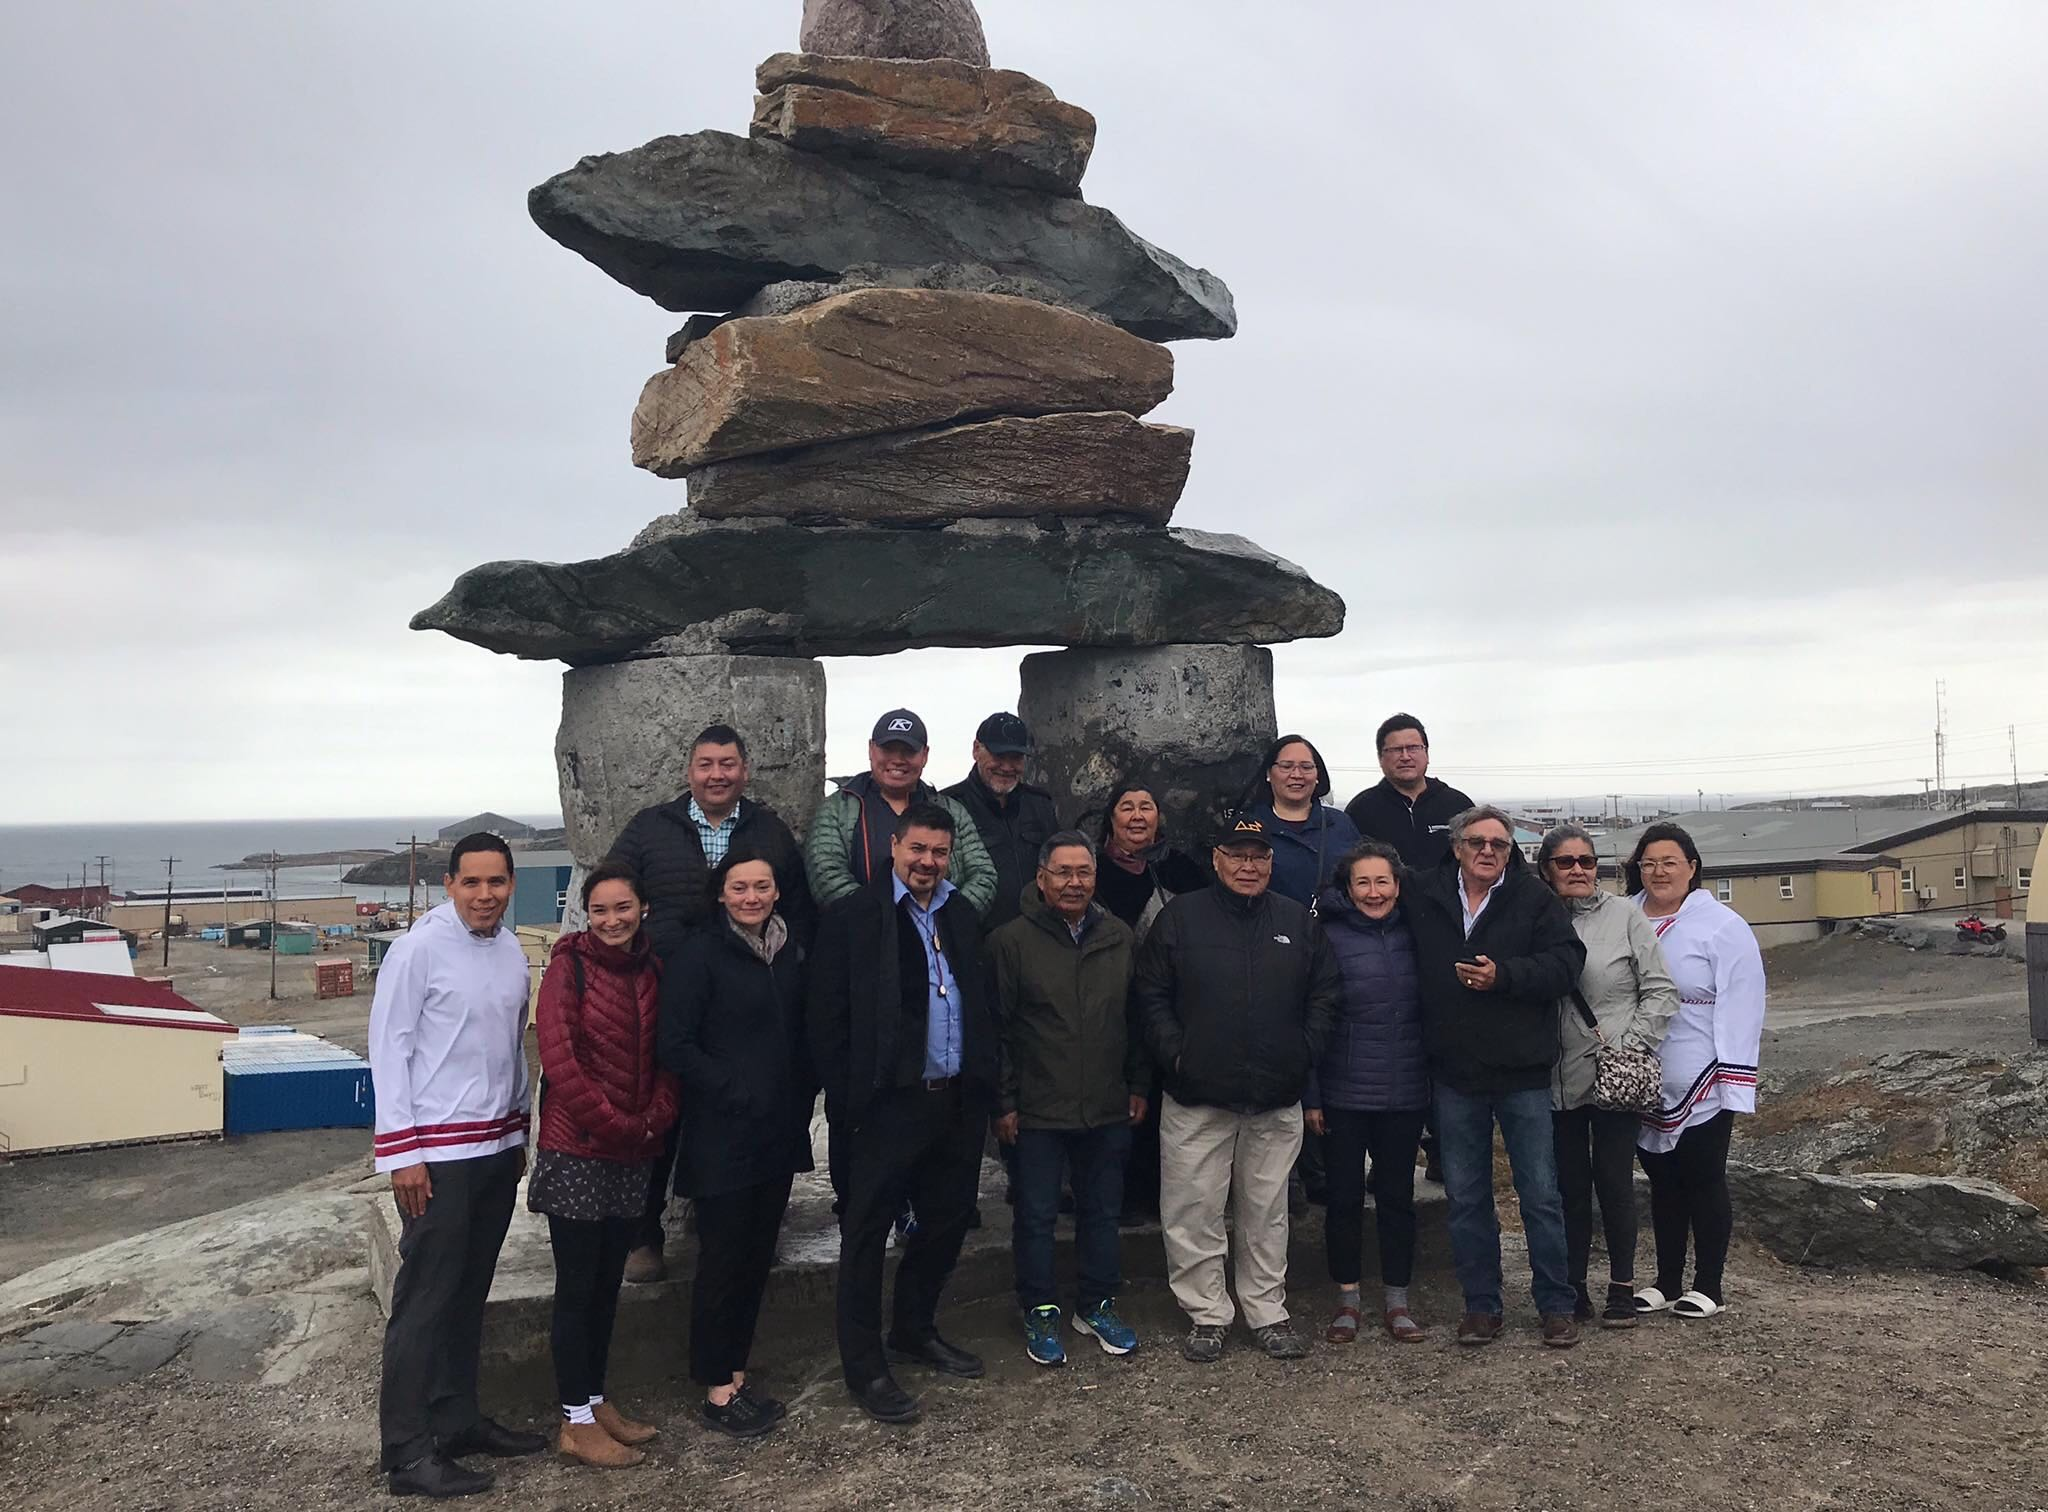 Inuit leaders discuss national priorities at ITK's annual general meeting | Nunatsiaq News